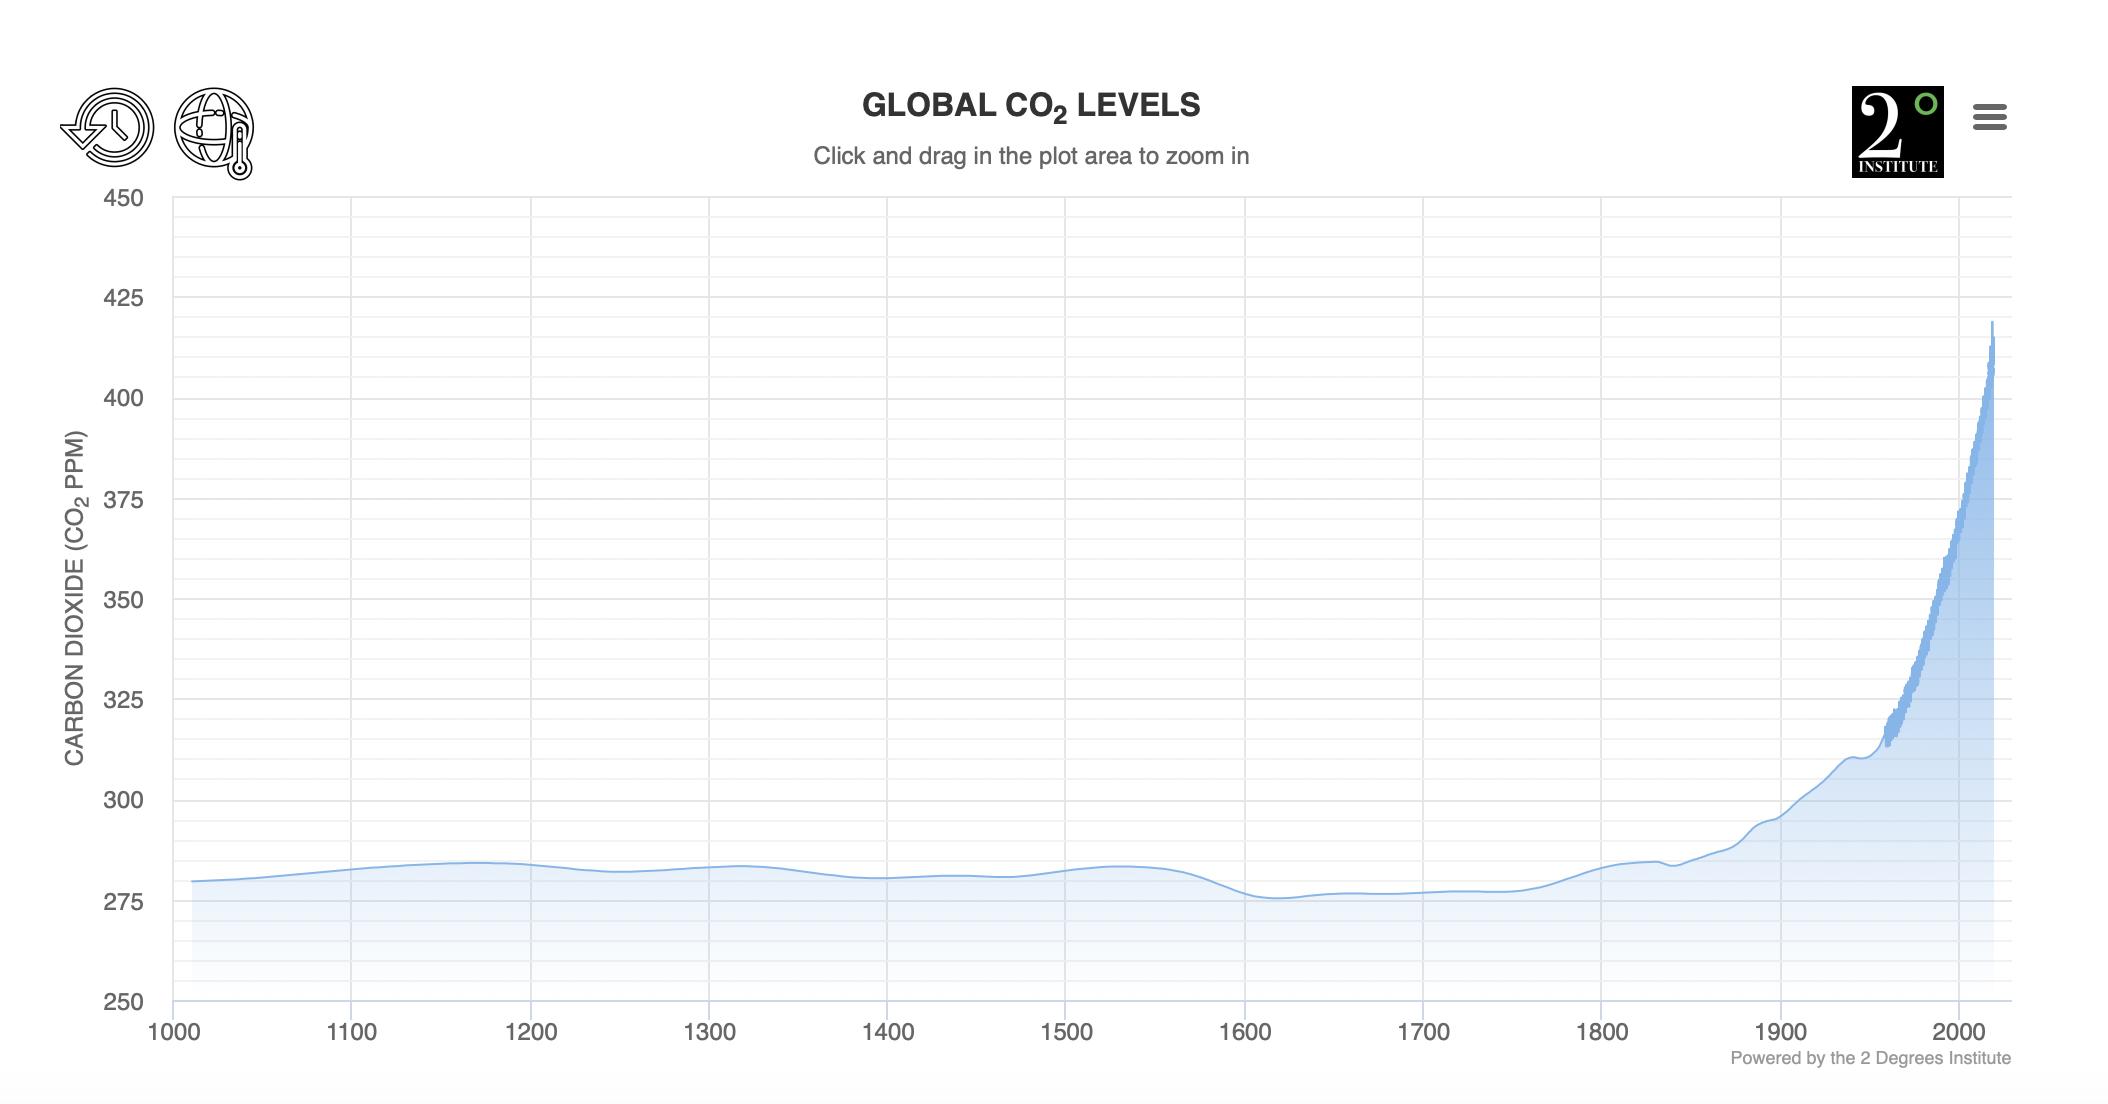 CO2 niveauet i atmosfæren gennem de seneste 1000 år.